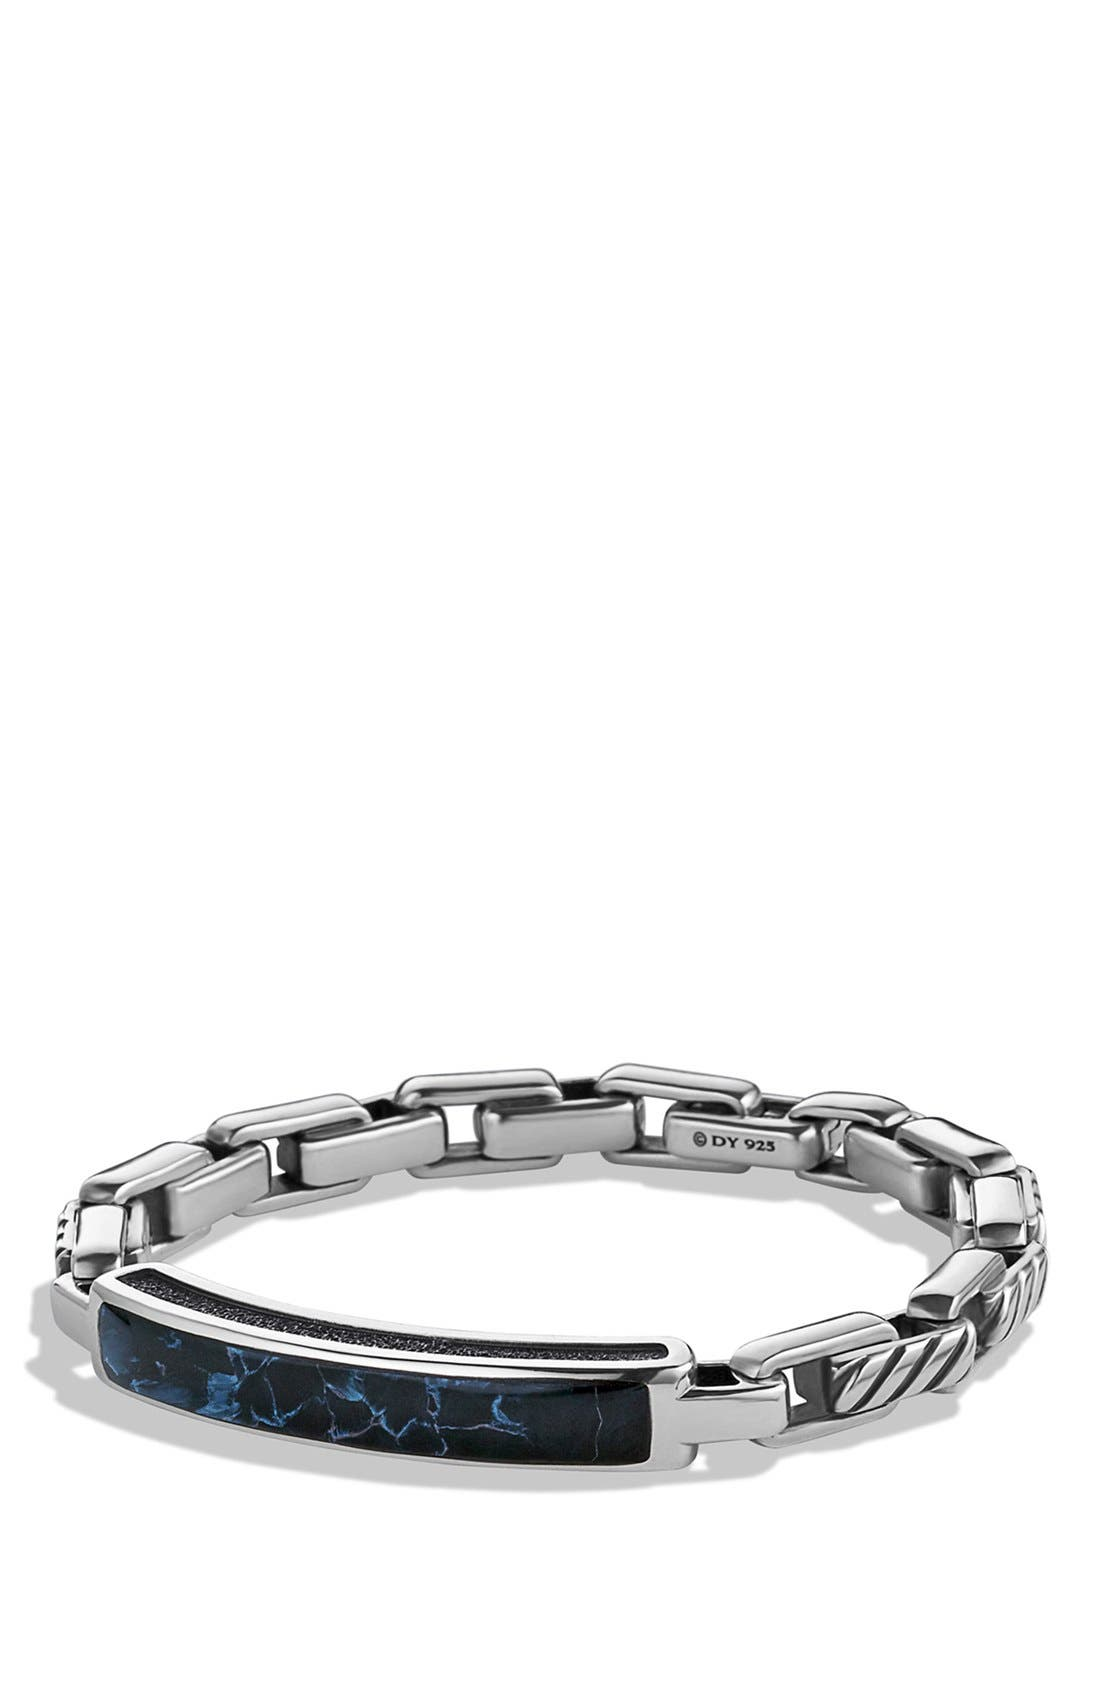 David Yurman ' Modern Cable' ID Bracelet